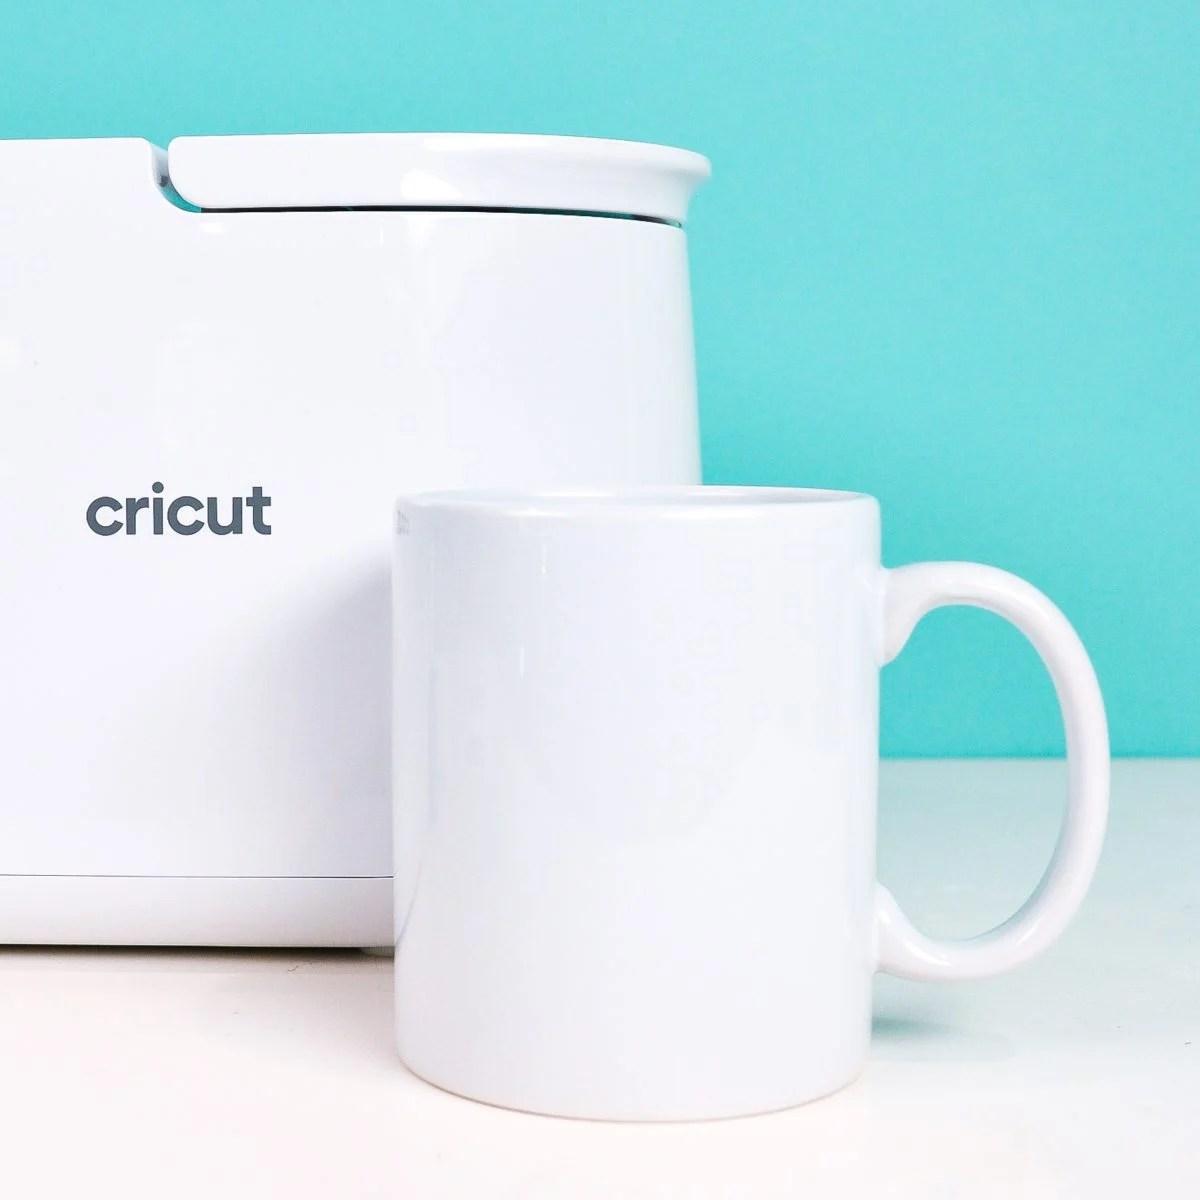 Blank Cricut mug in front of Cricut Mug Press